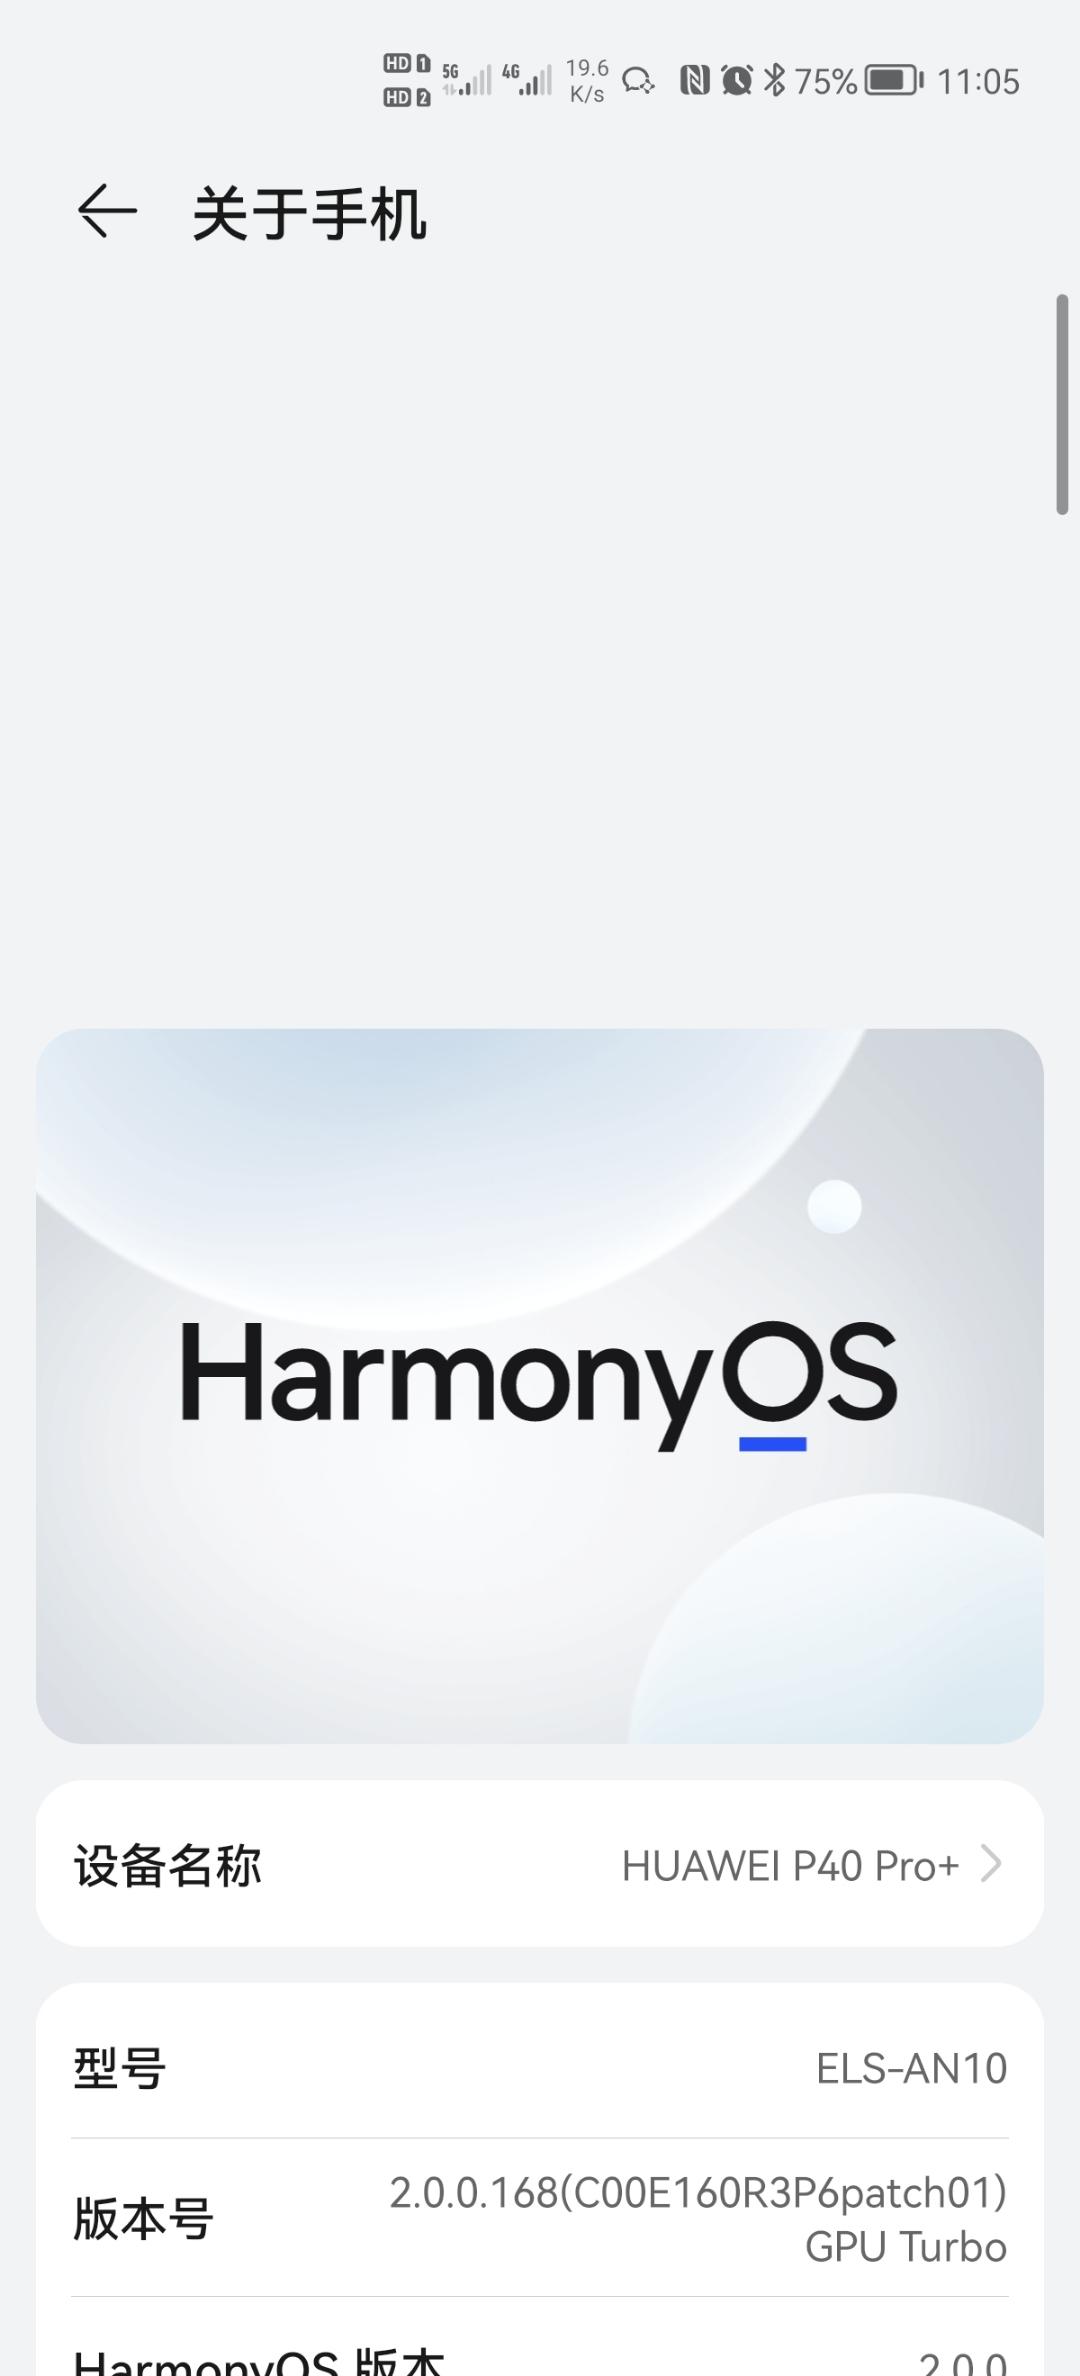 Screenshot_20210918_110546_com.android.settings.jpg